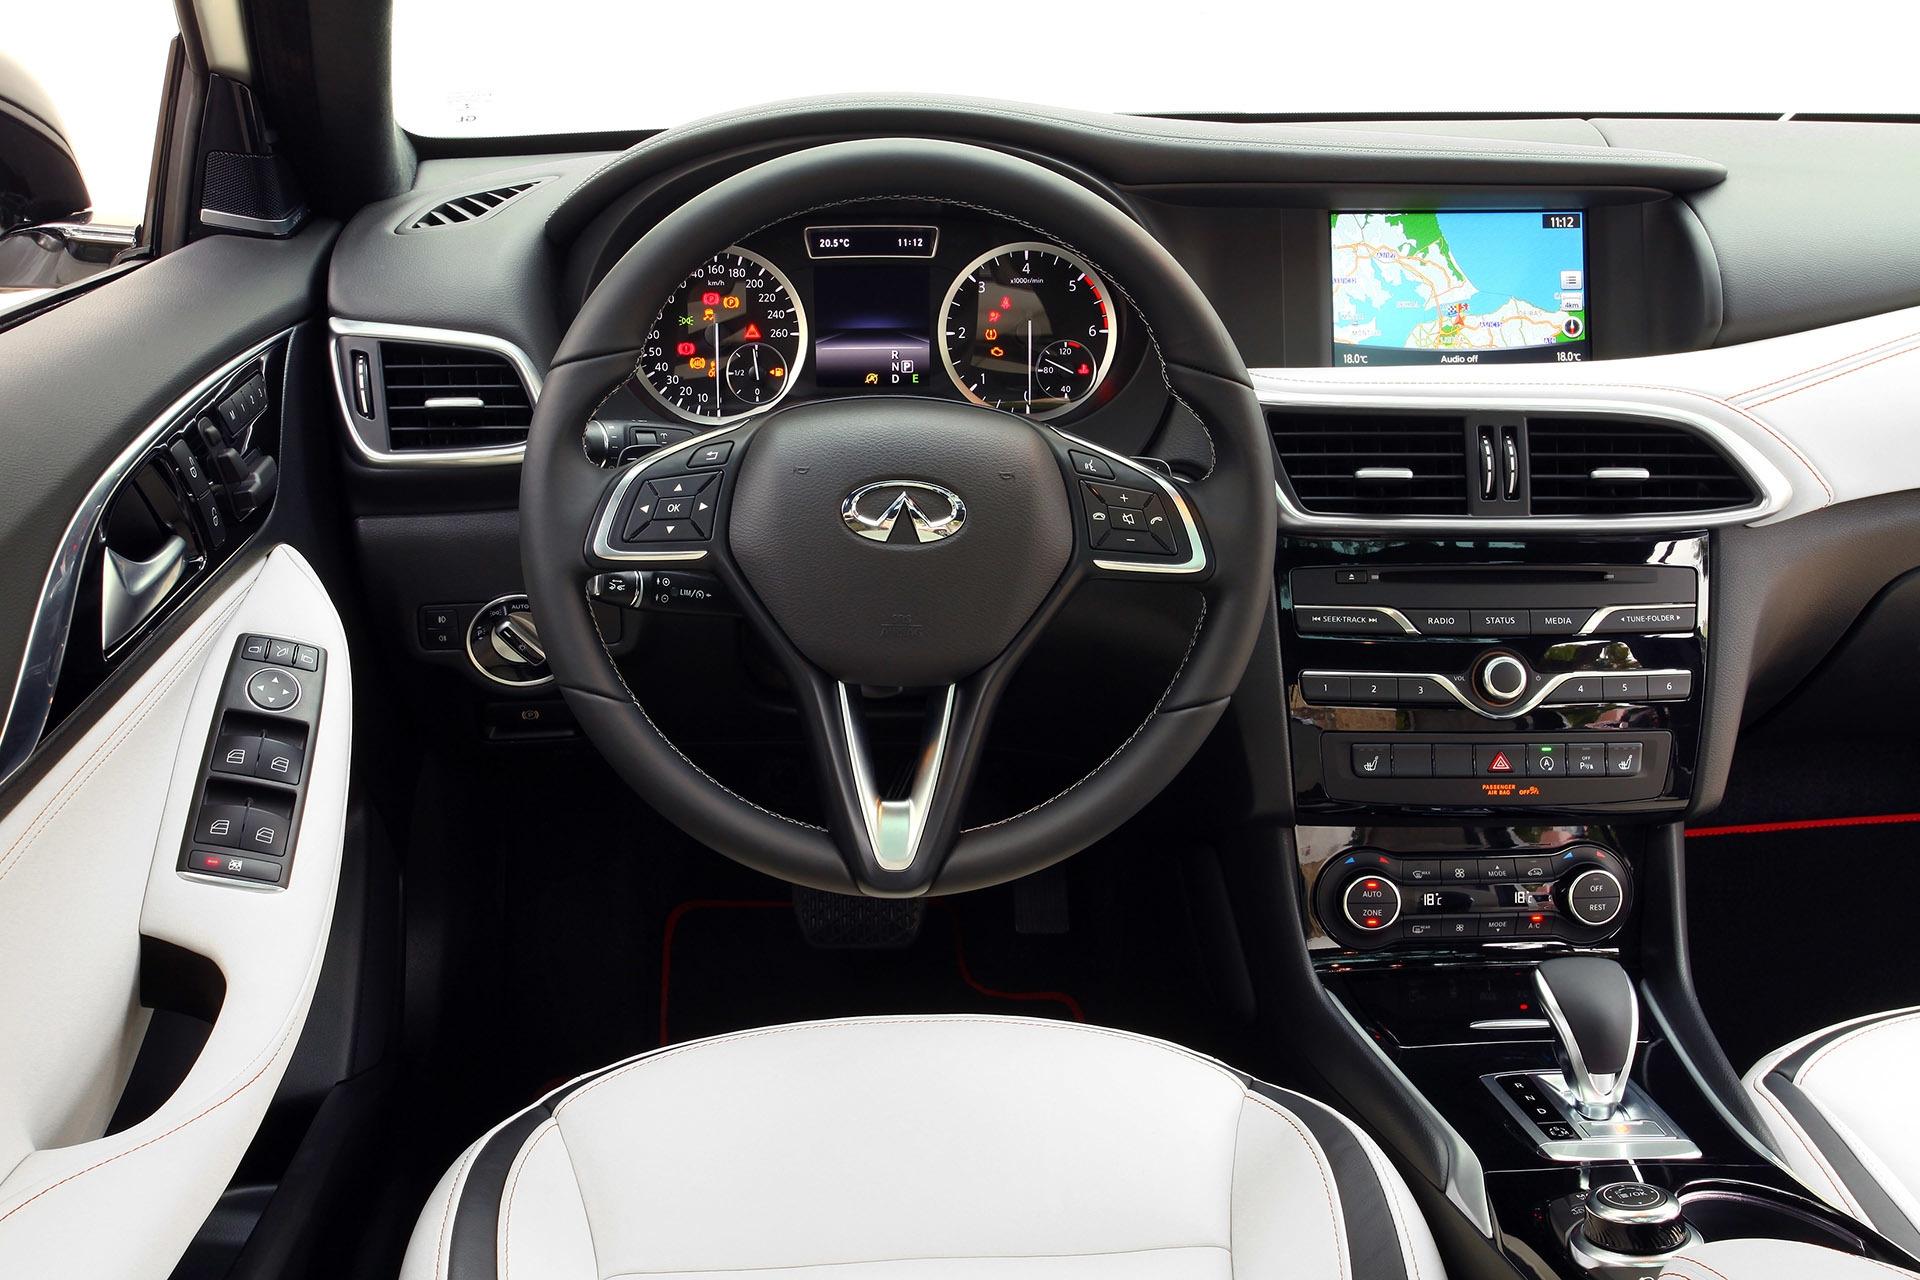 Cgnrz Wfedu on Toyota Land Cruiser Interior